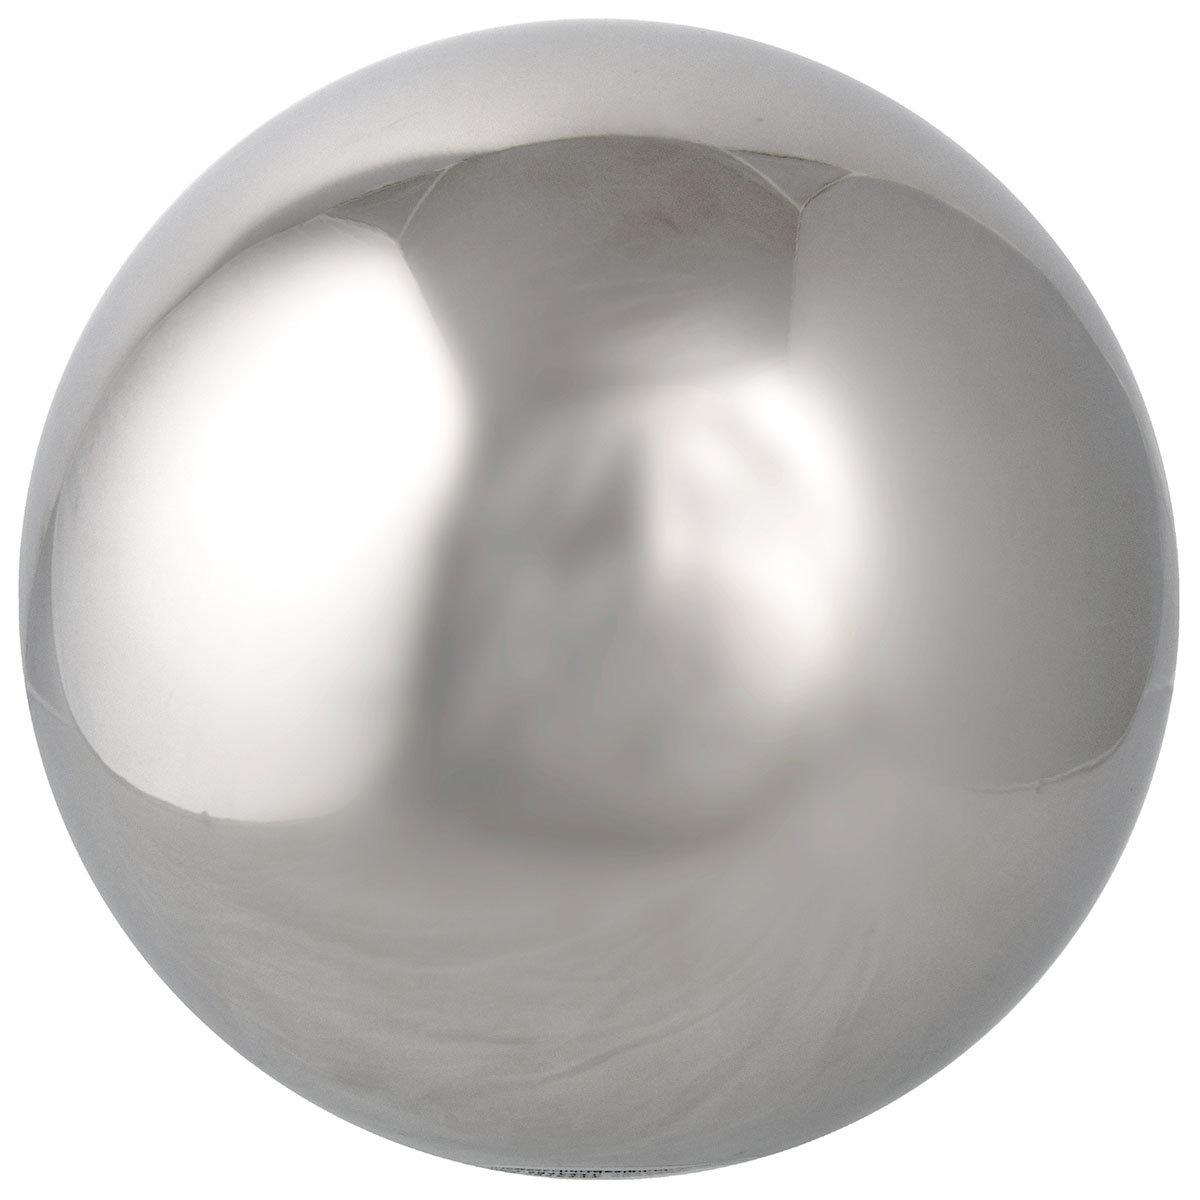 Dekokugel Edelstahl L, 20 cm | #2